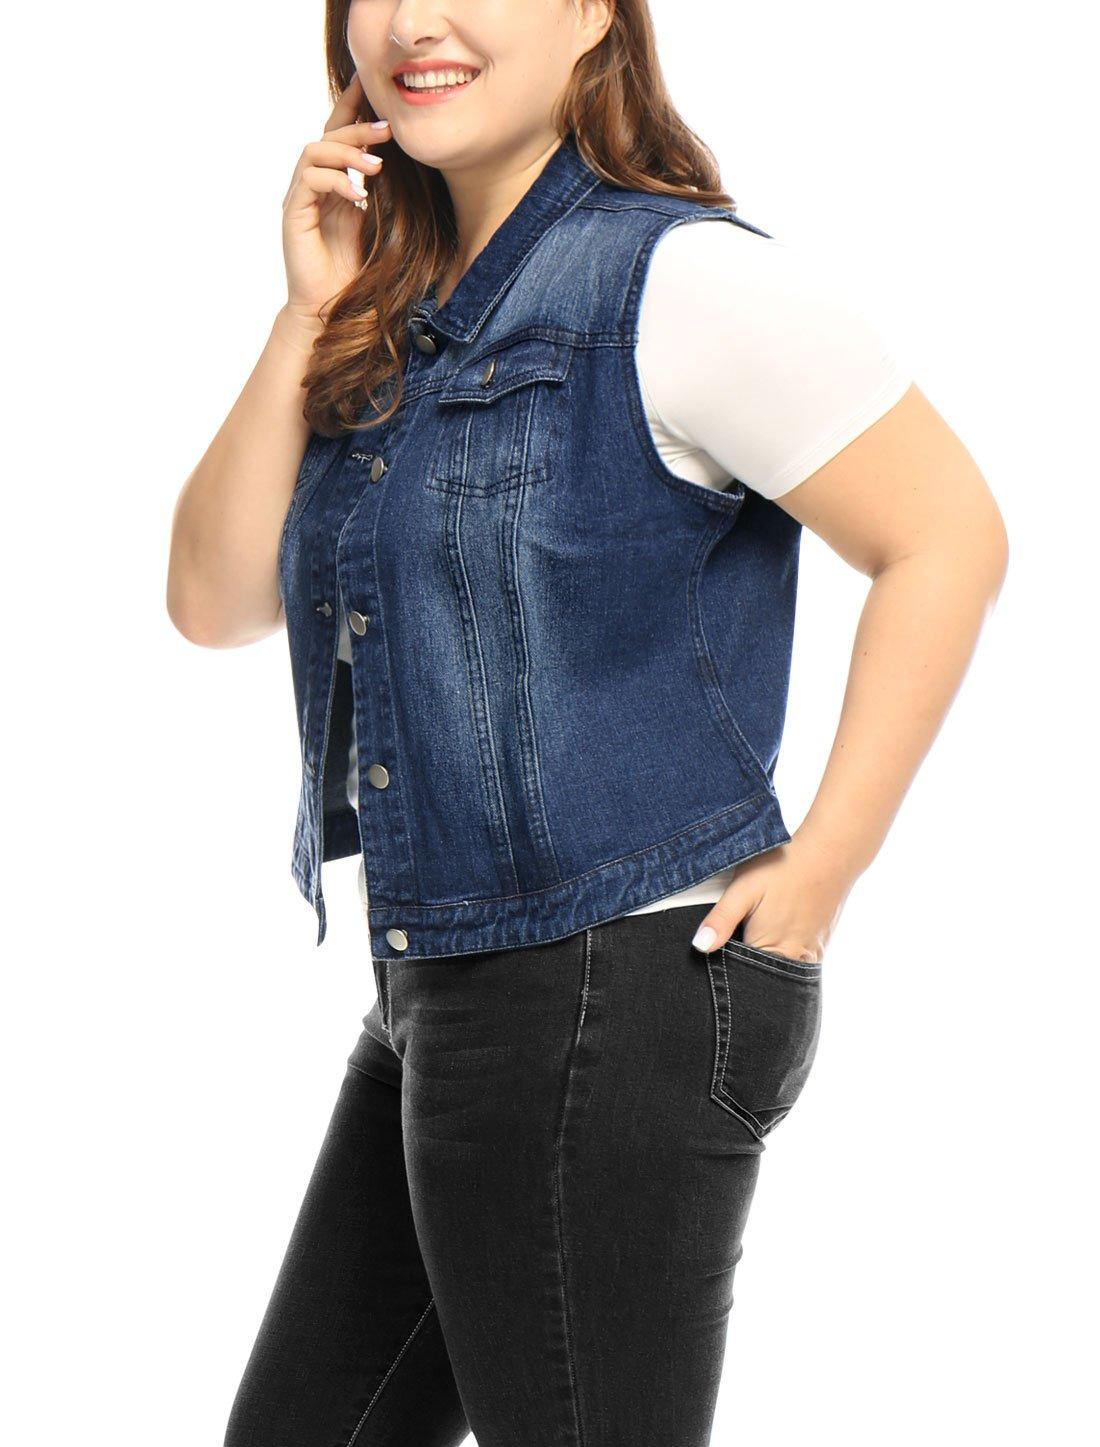 uxcell Women Plus Size Slim Fit Denim Vest Blue 1X by uxcell (Image #3)